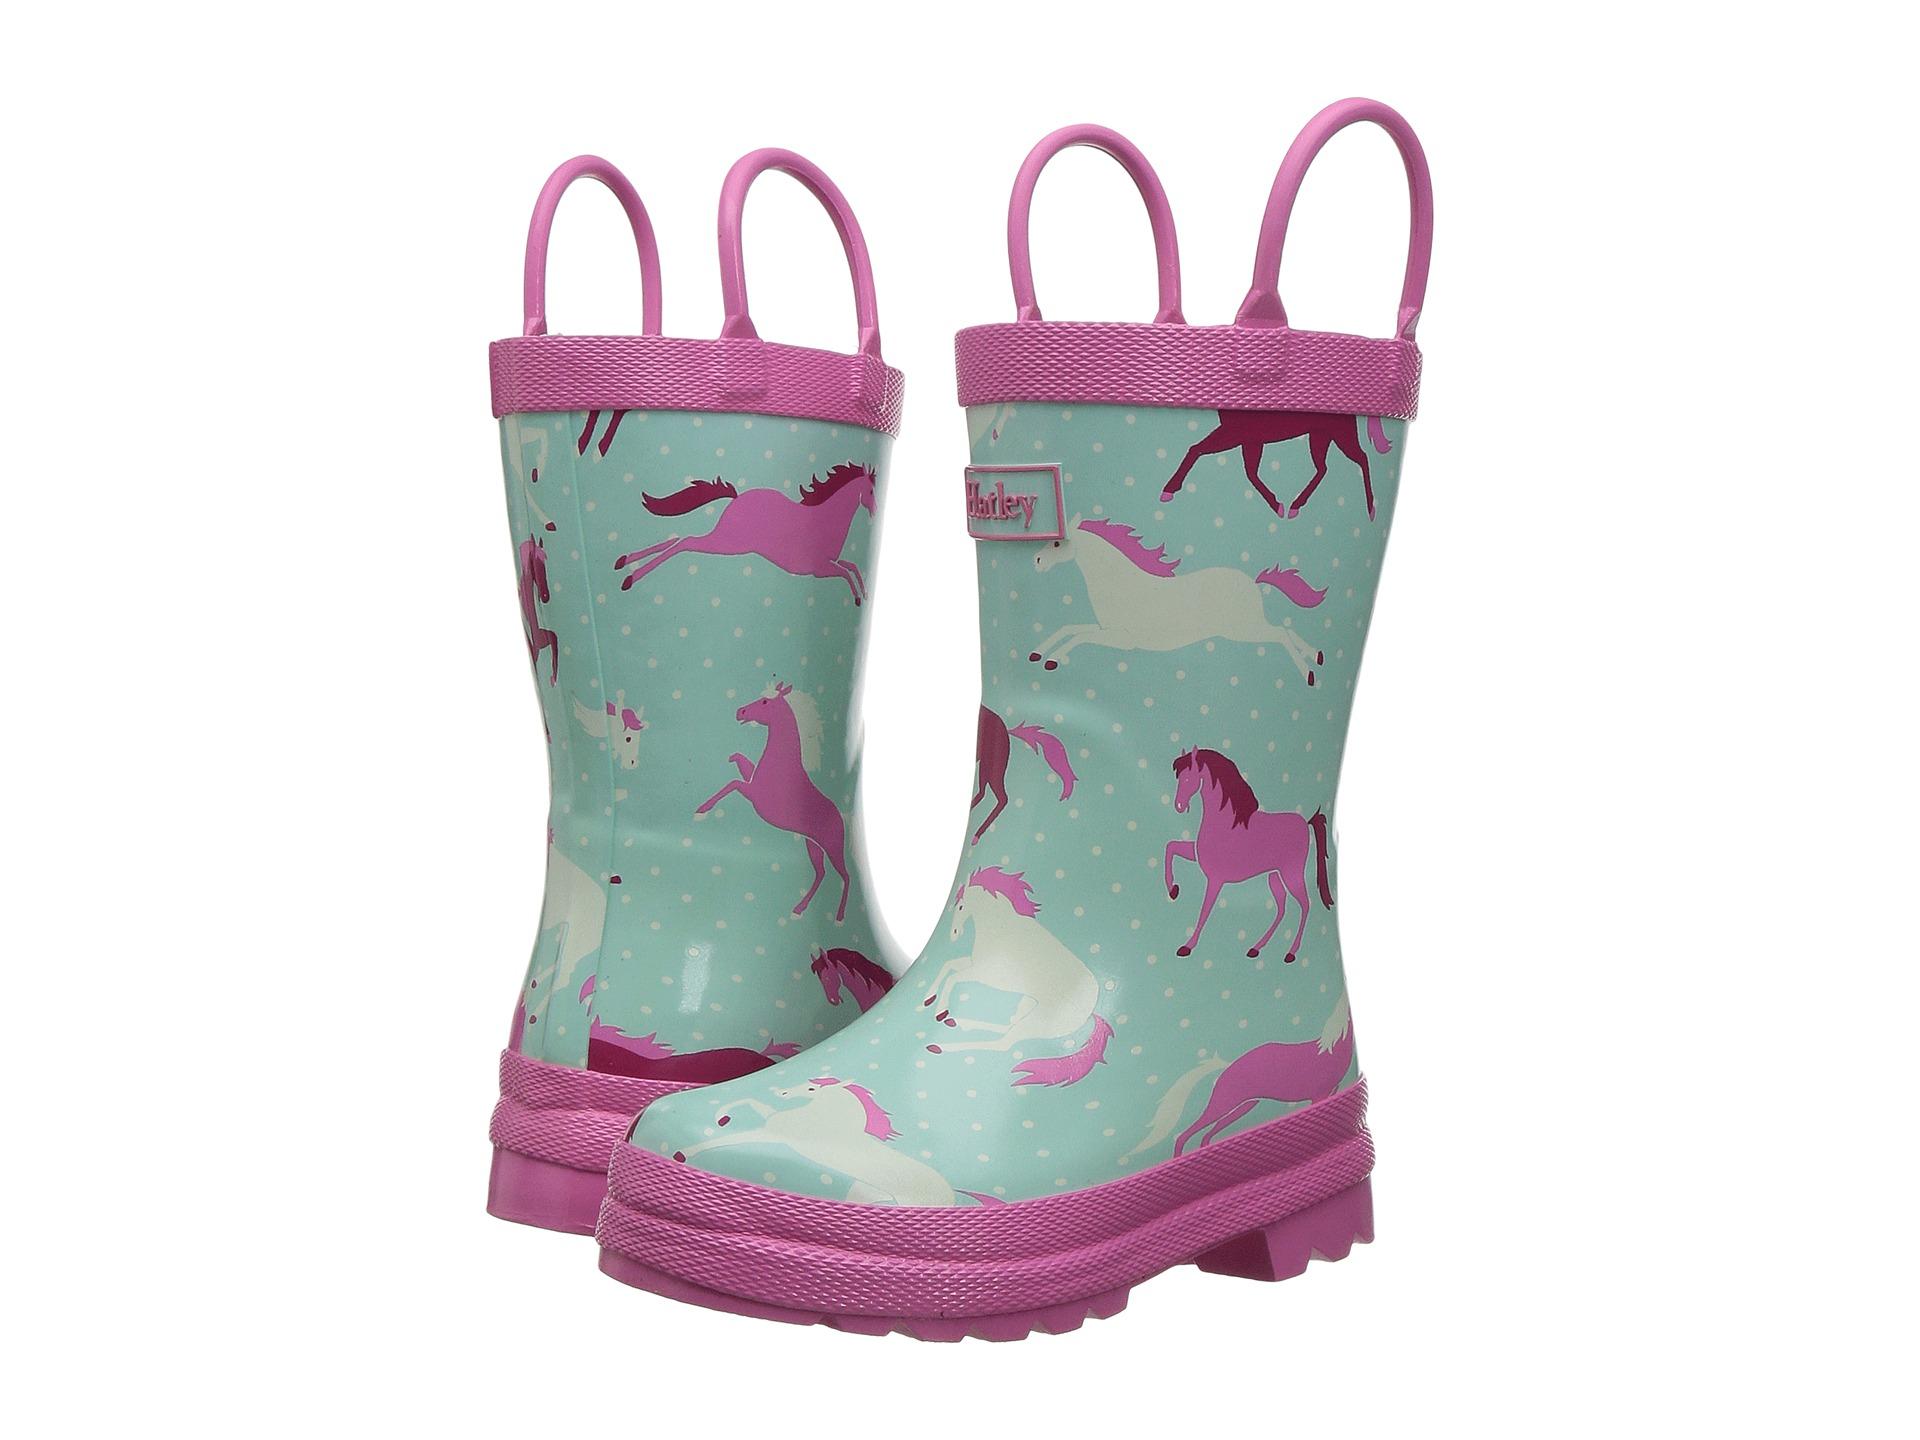 Girls Rain Boots, Girls | Shipped Free at Zappos